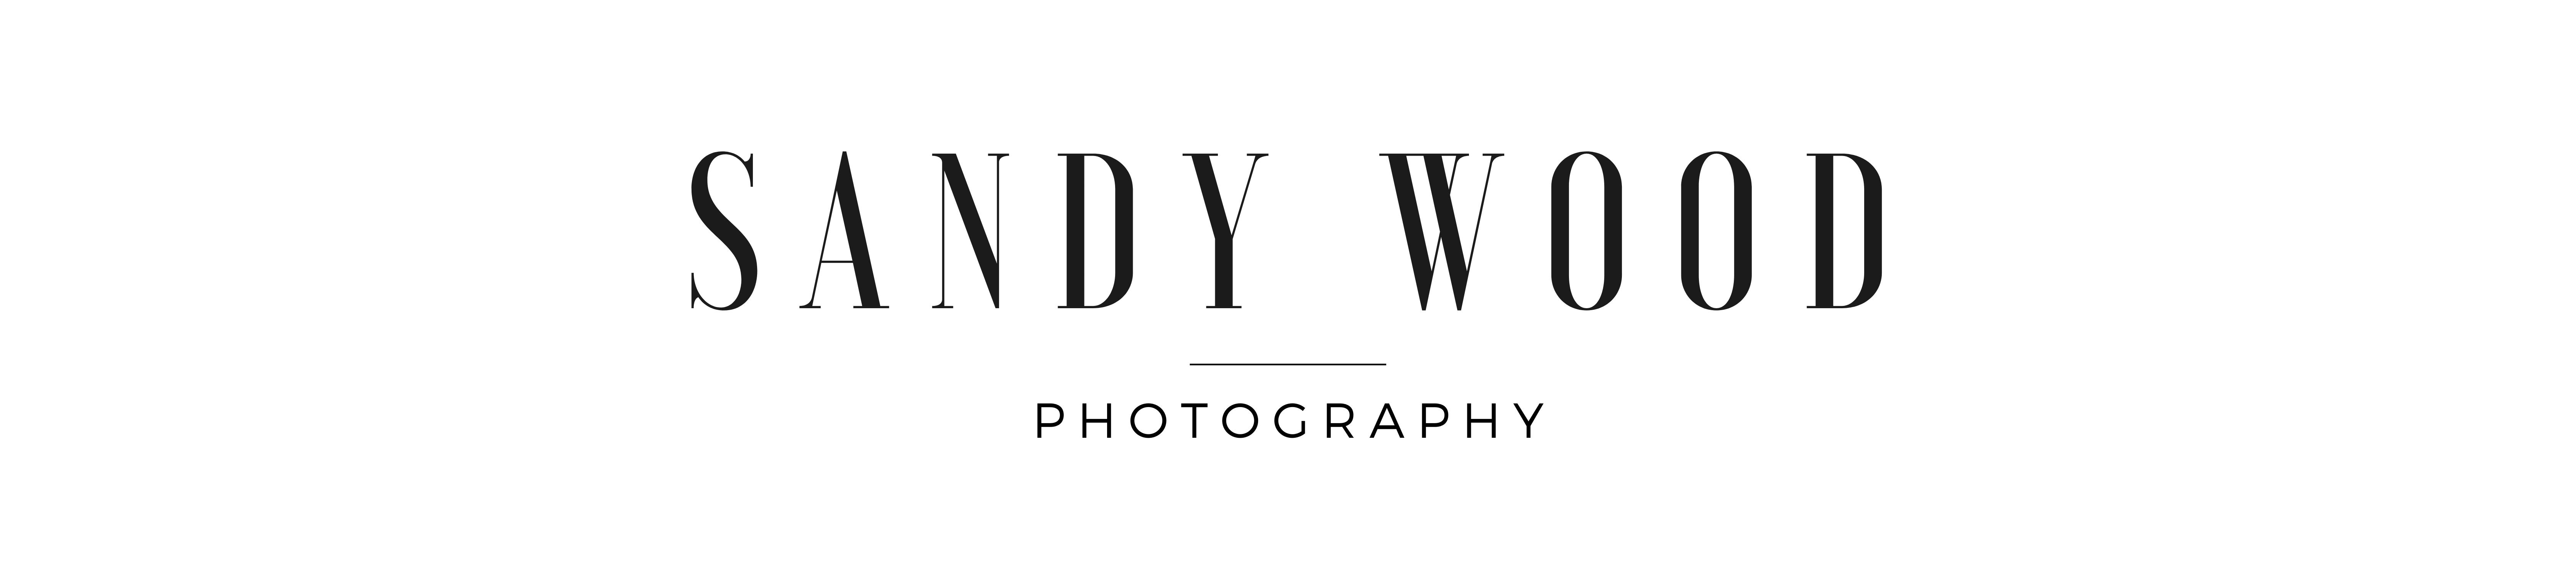 Sandy Wood